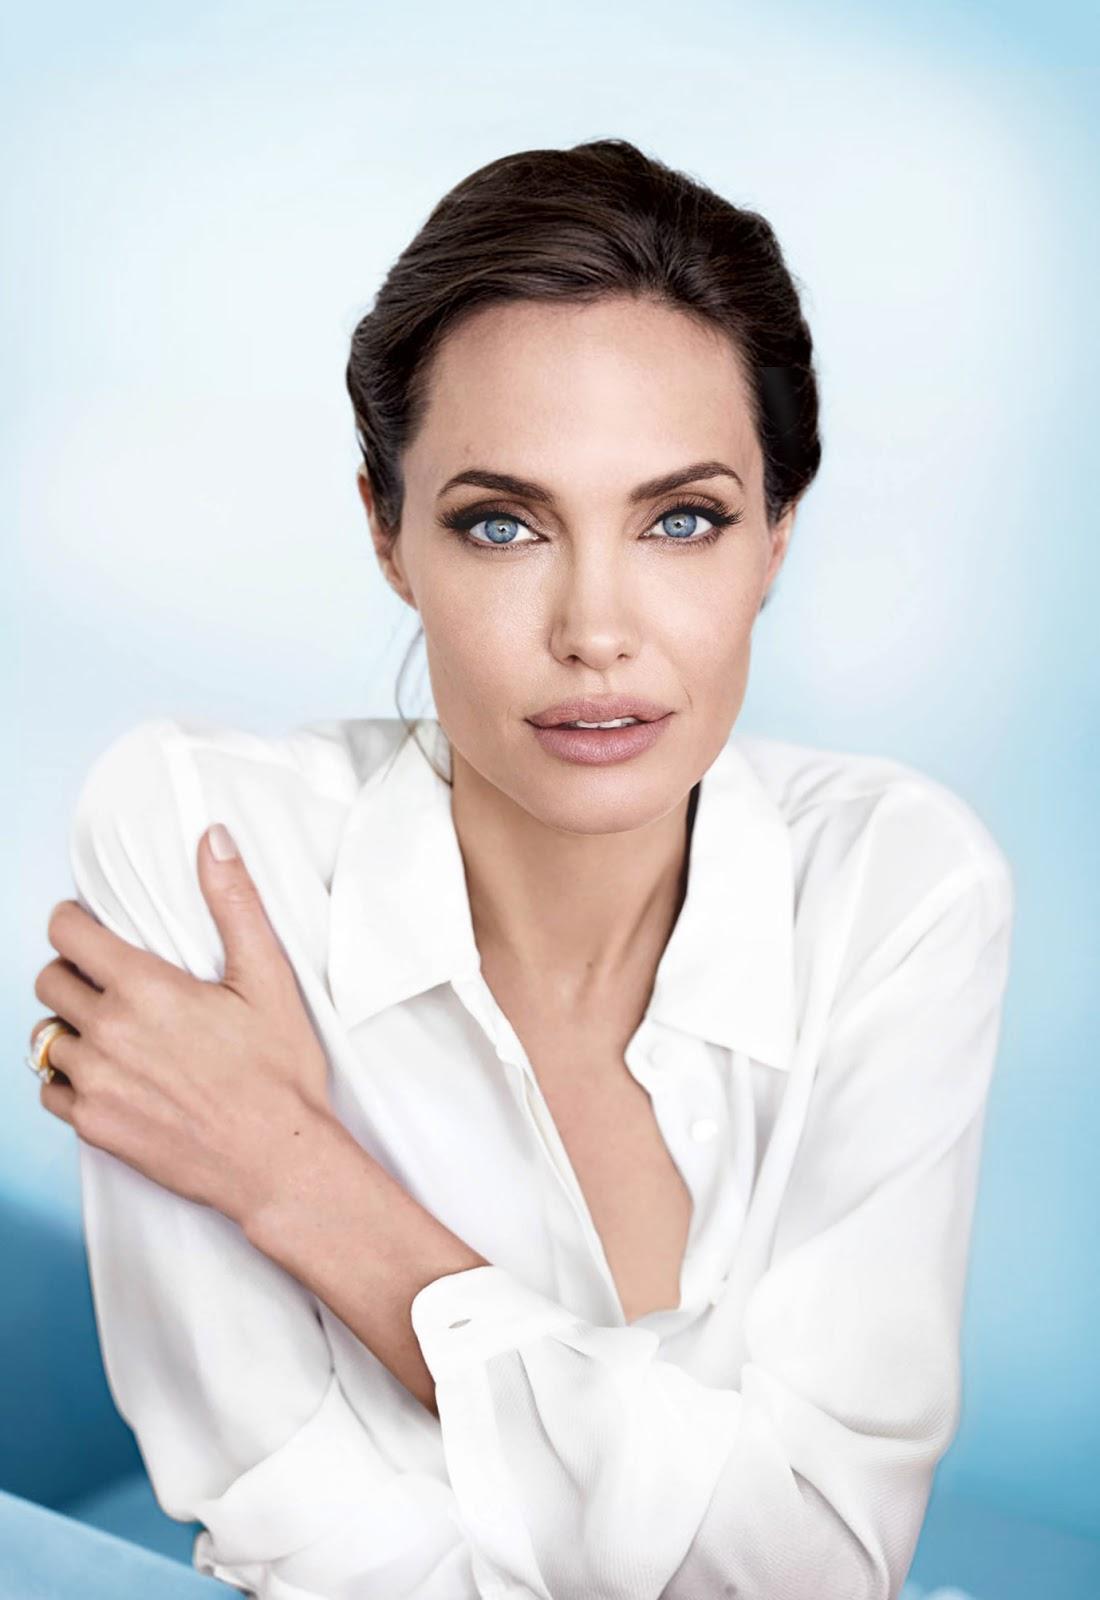 Loveisspeed Angelina Jolie For Vanity Fair By